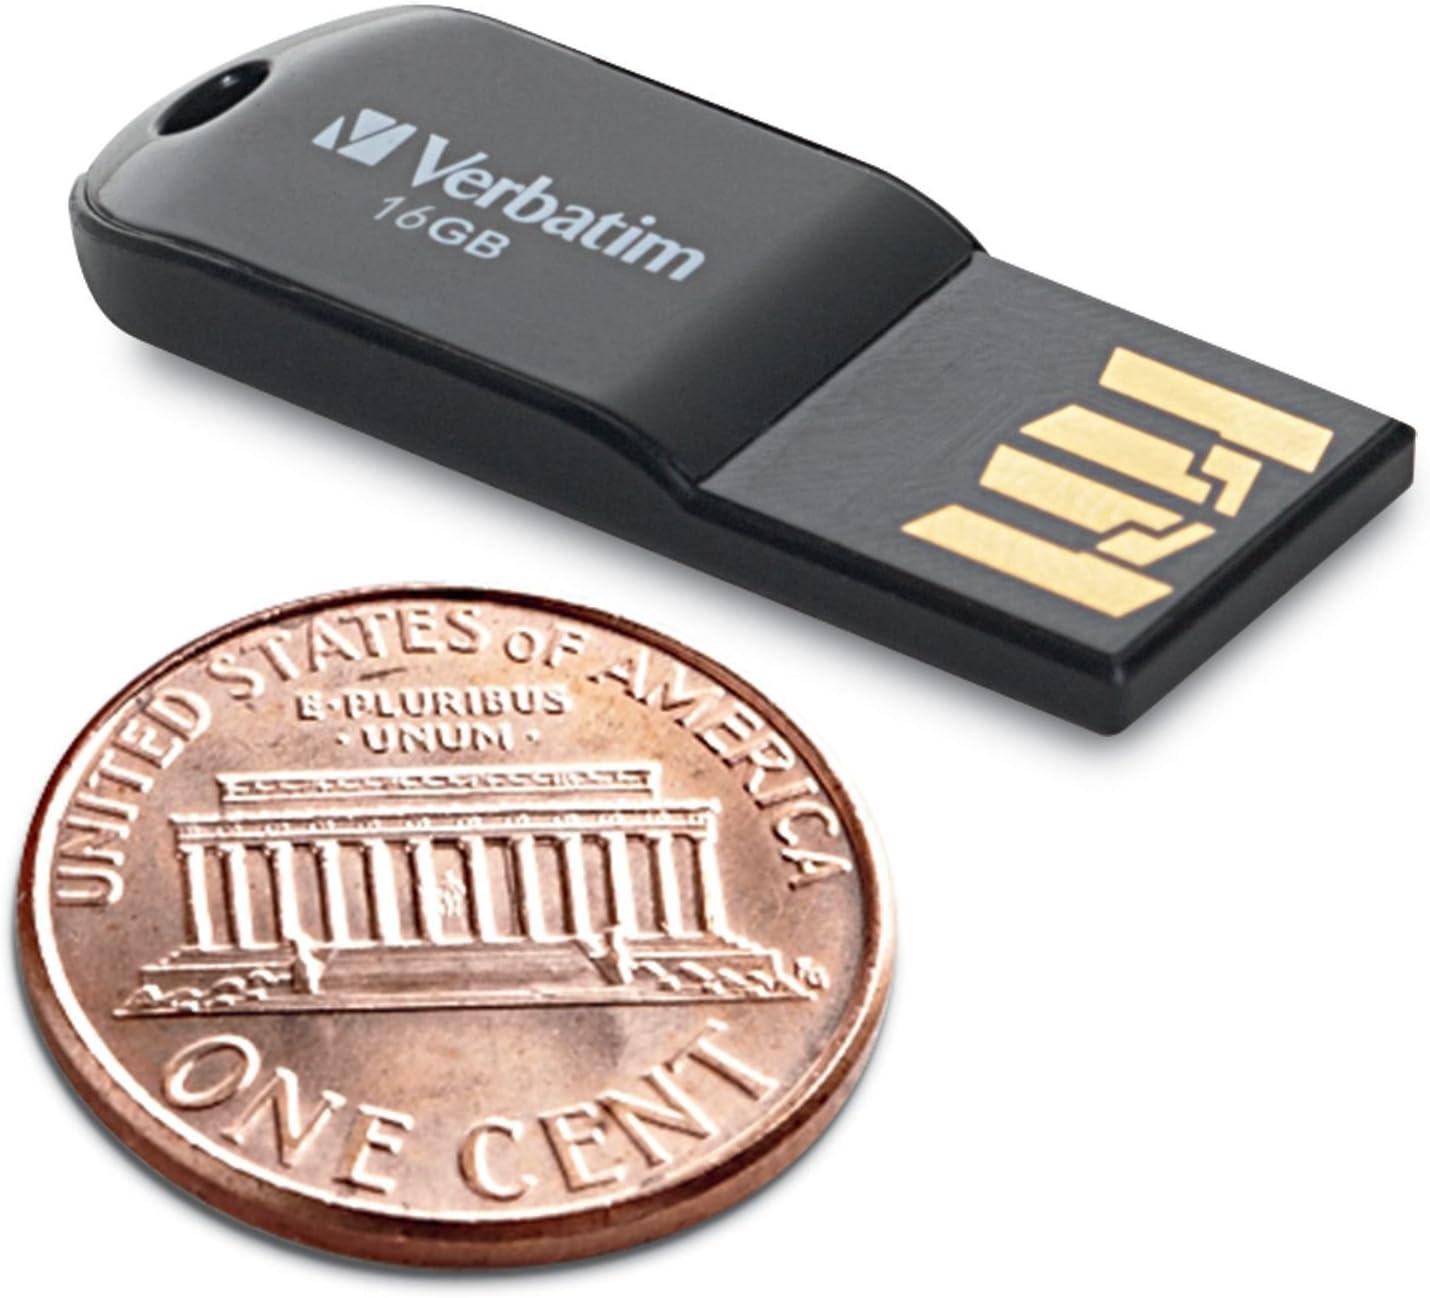 Black 44050 Verbatim 16GB Micro USB Flash Drive